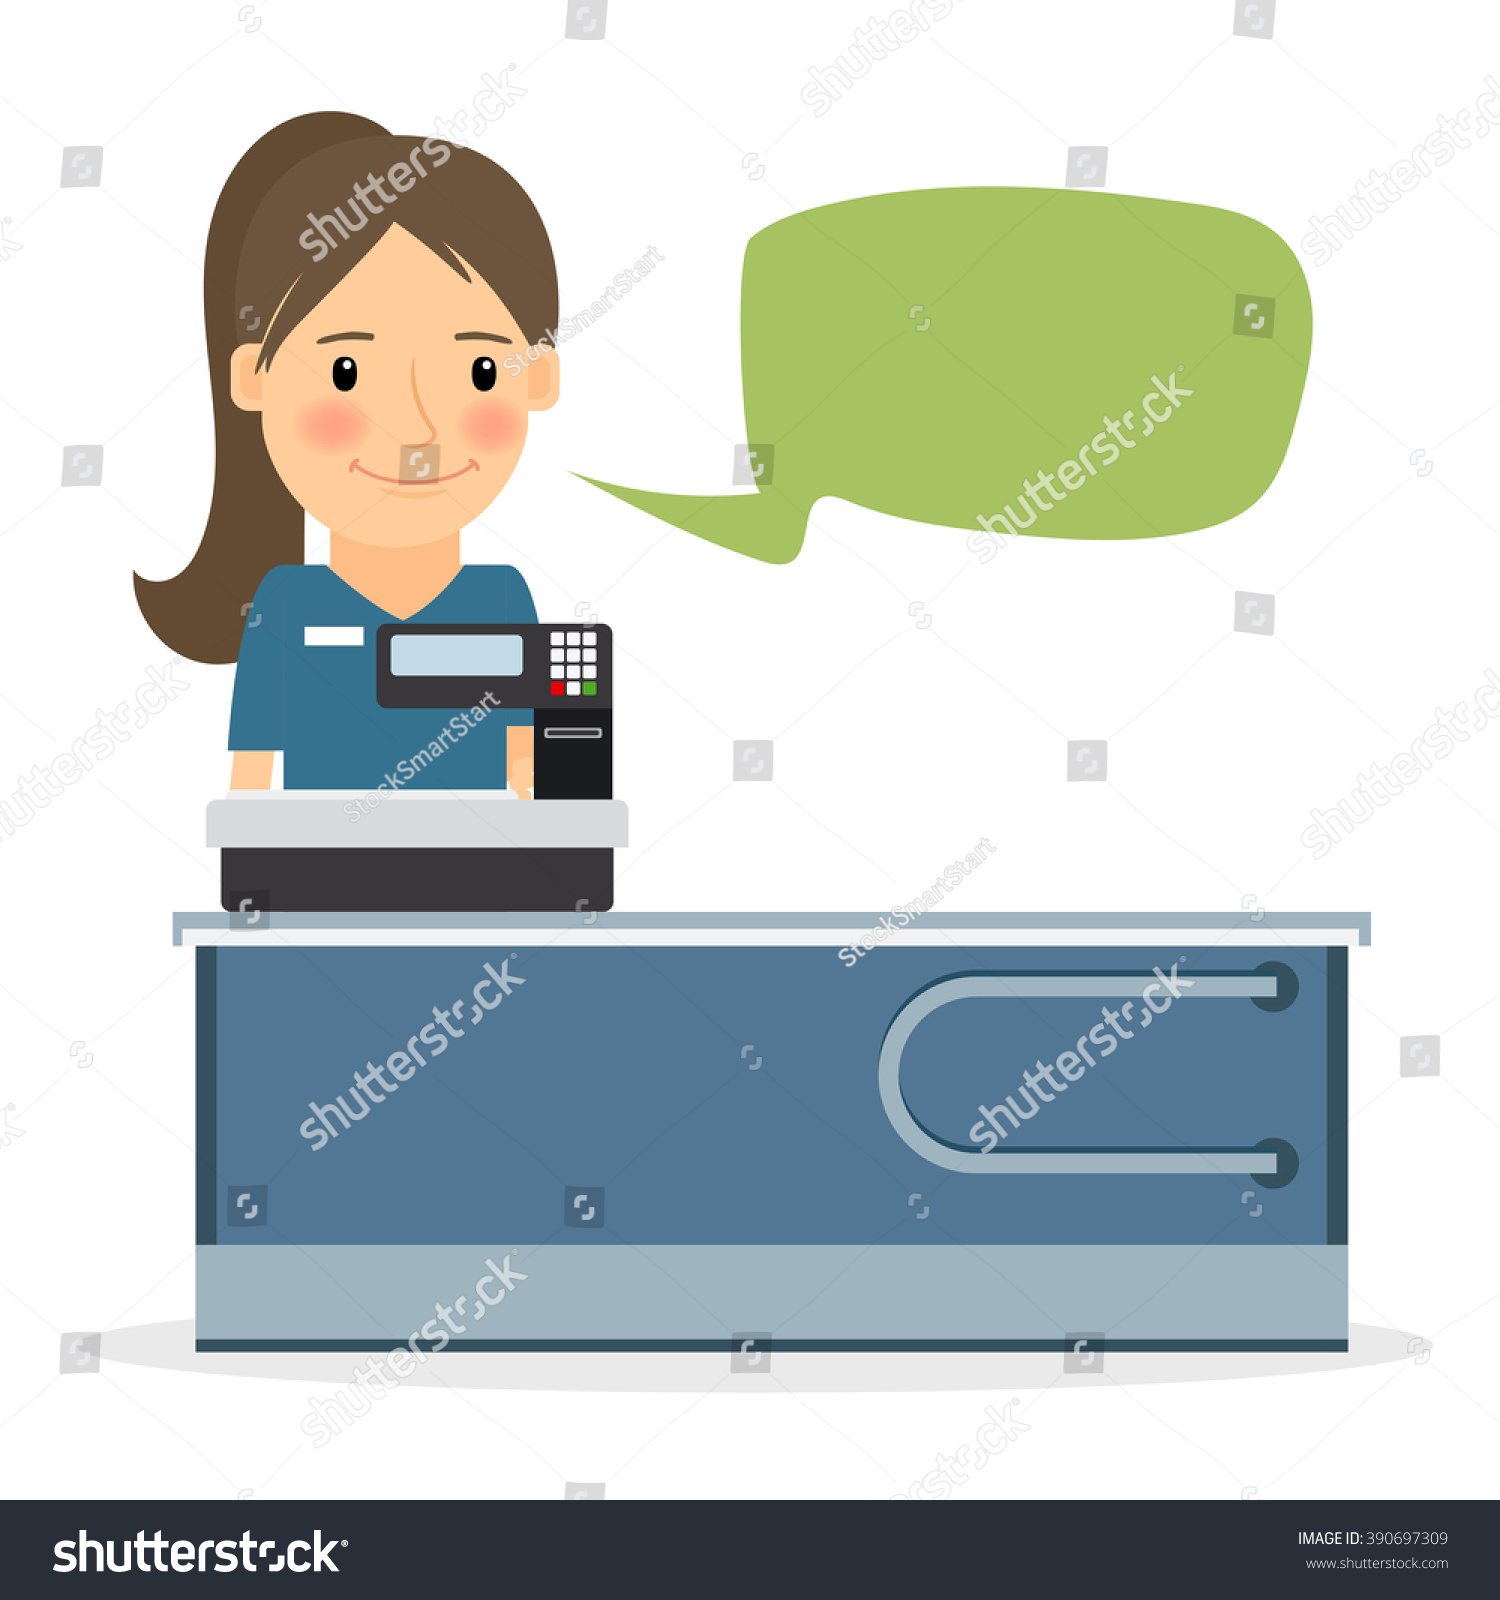 supermarket store cashier w s clerk stock vector  supermarket store cashier w or s clerk at store female cashier vector icon